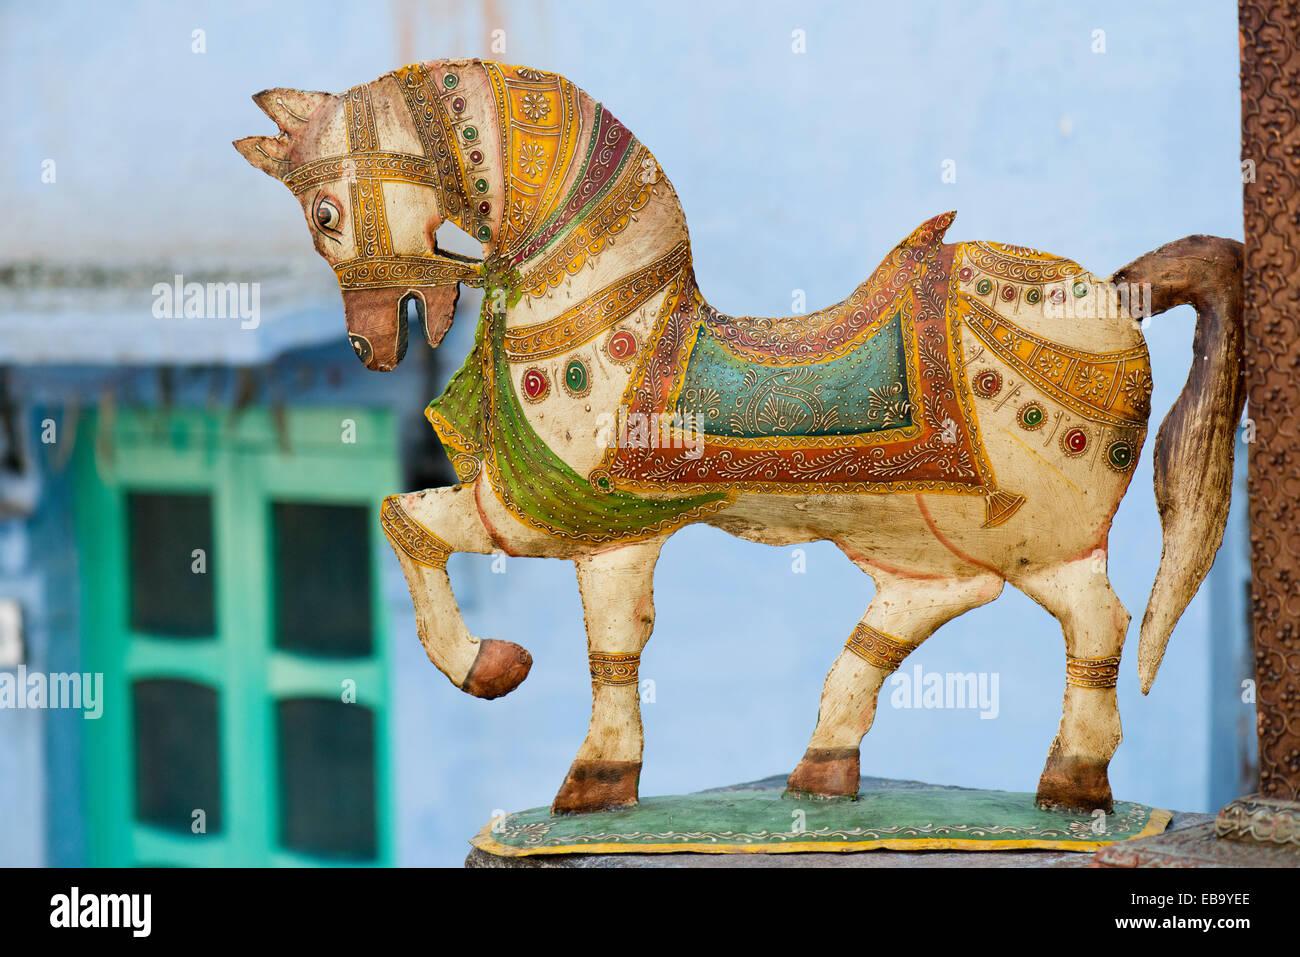 Horse Sculpture Arts Crafts Jodhpur Rajasthan India Stock Photo Alamy